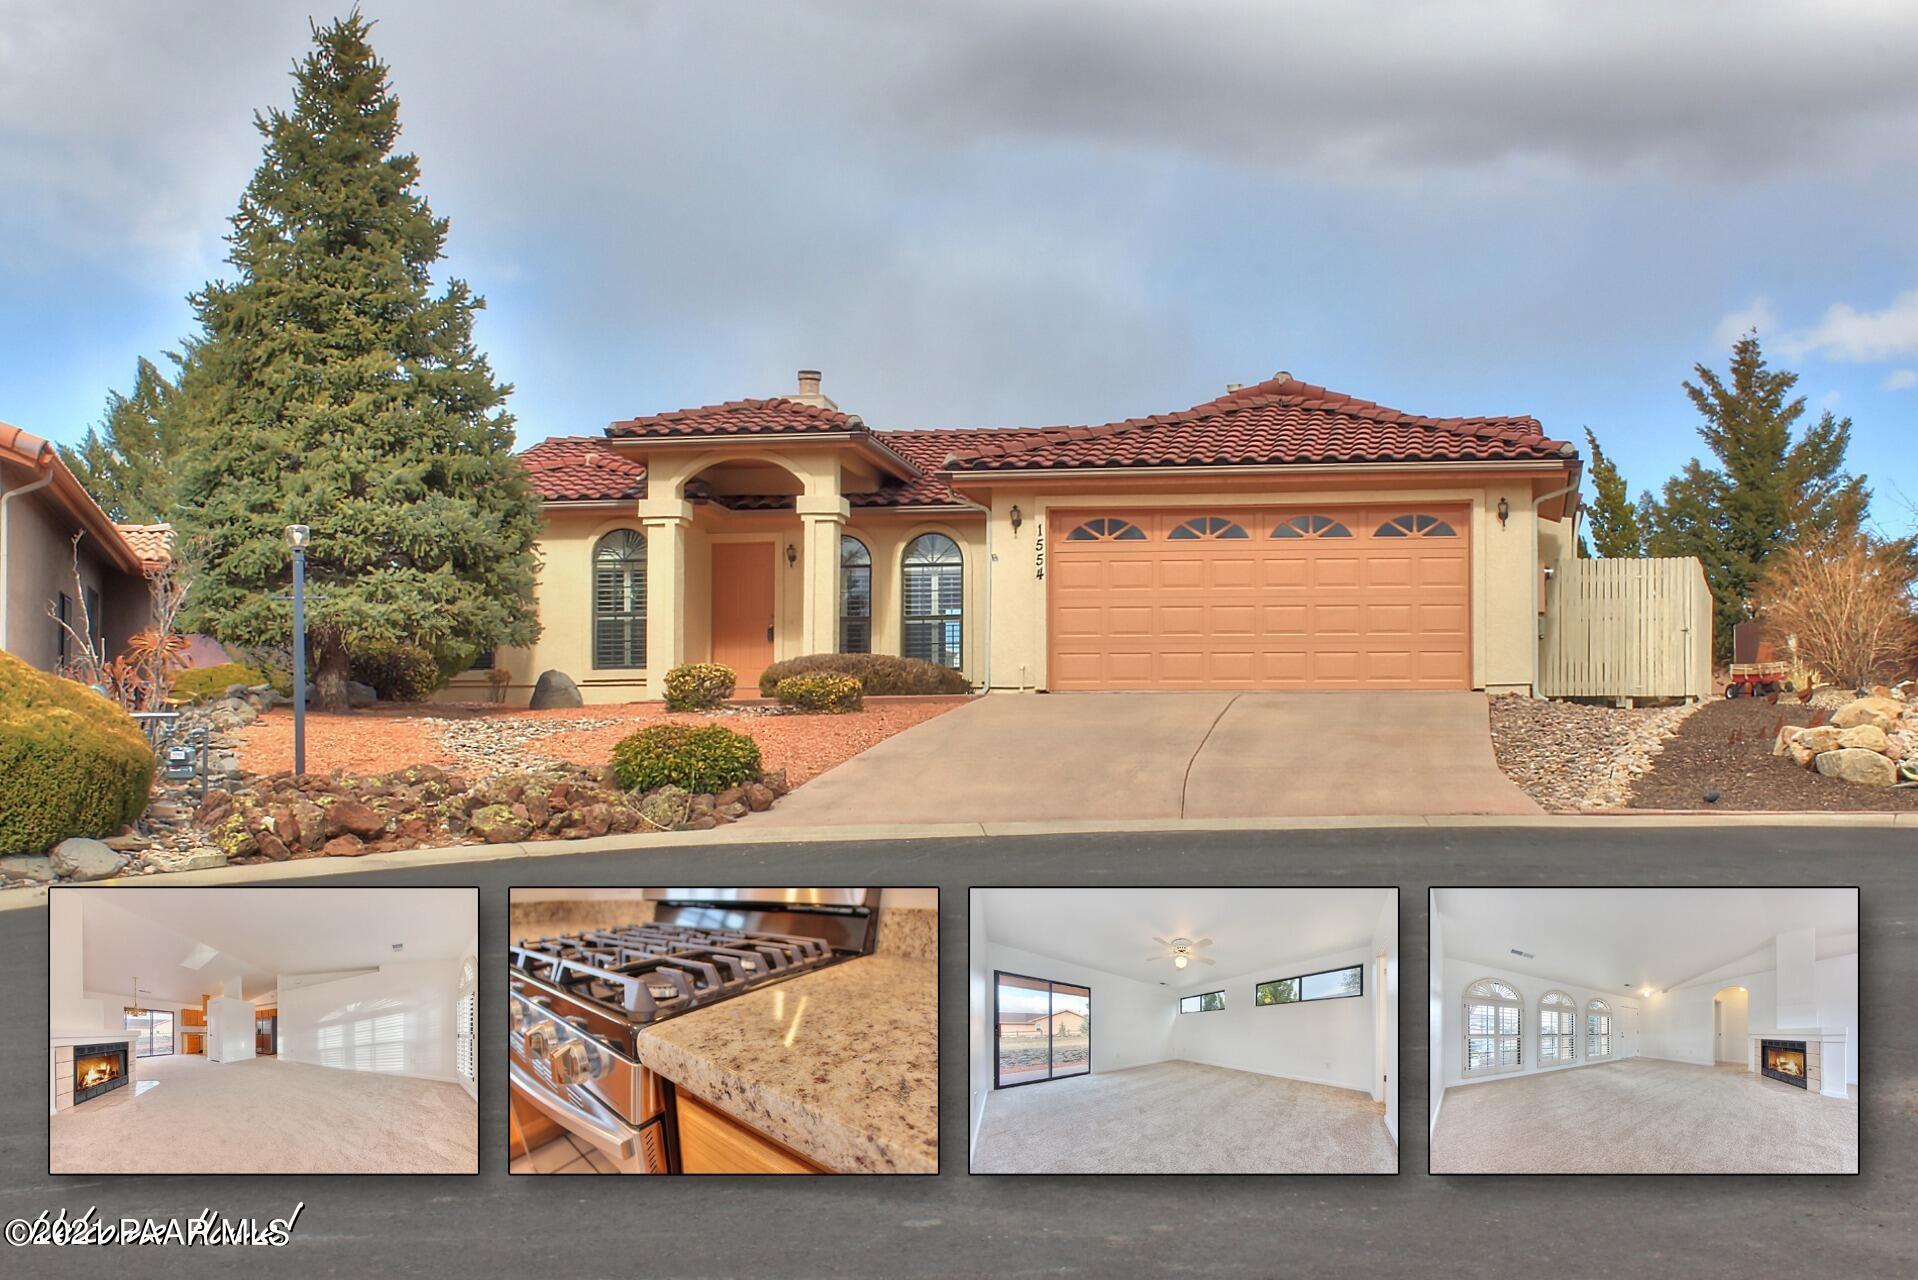 Photo of 1554 Marvin Gardens, Prescott, AZ 86301